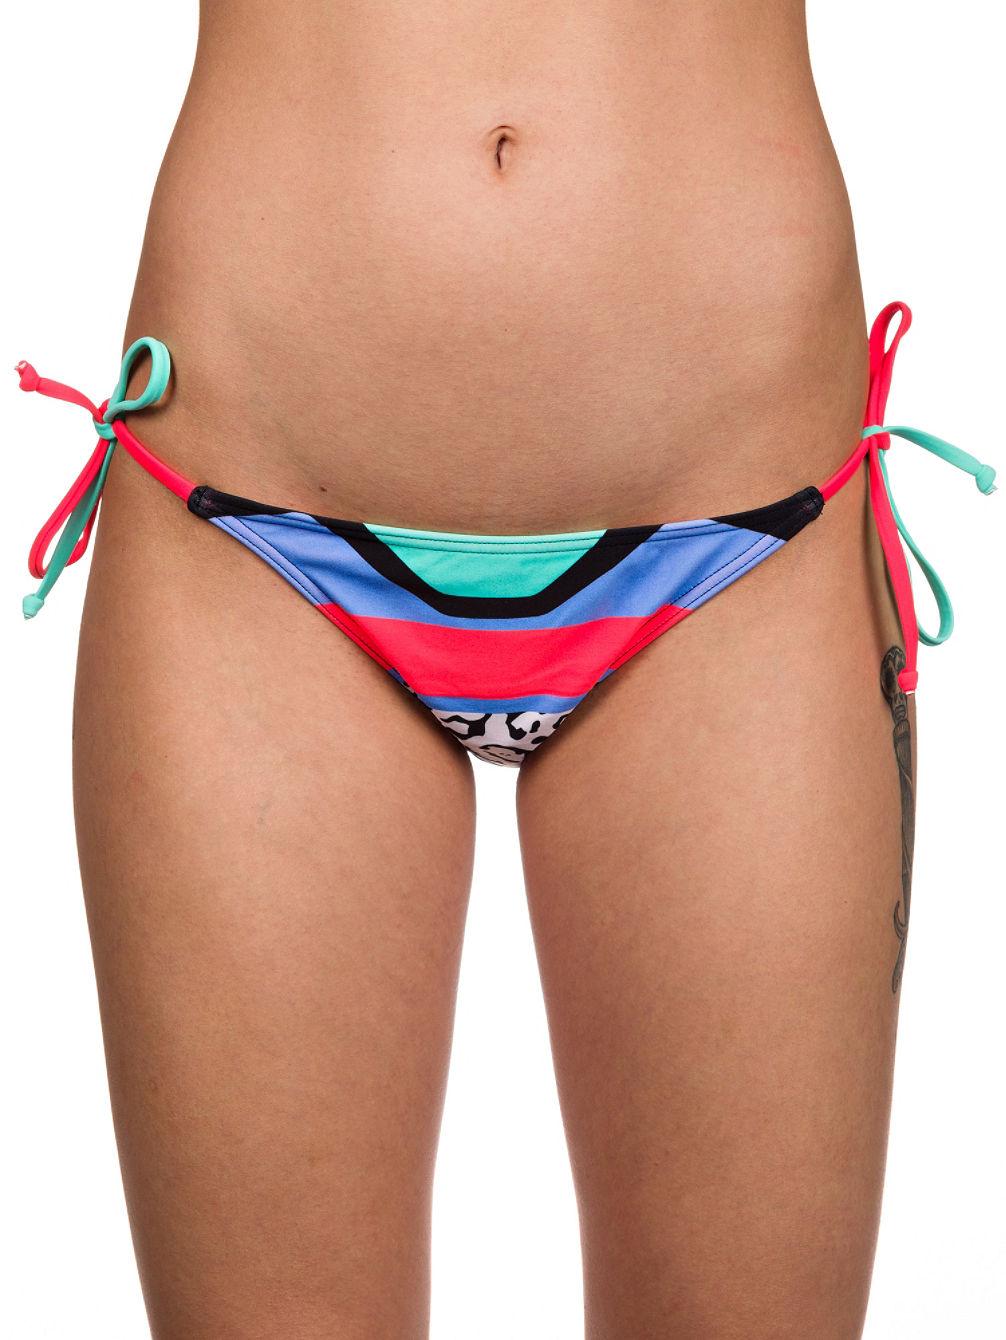 d4c98c15da Buy Fox Stereo Side Tie Bikini Bottom online at blue-tomato.com